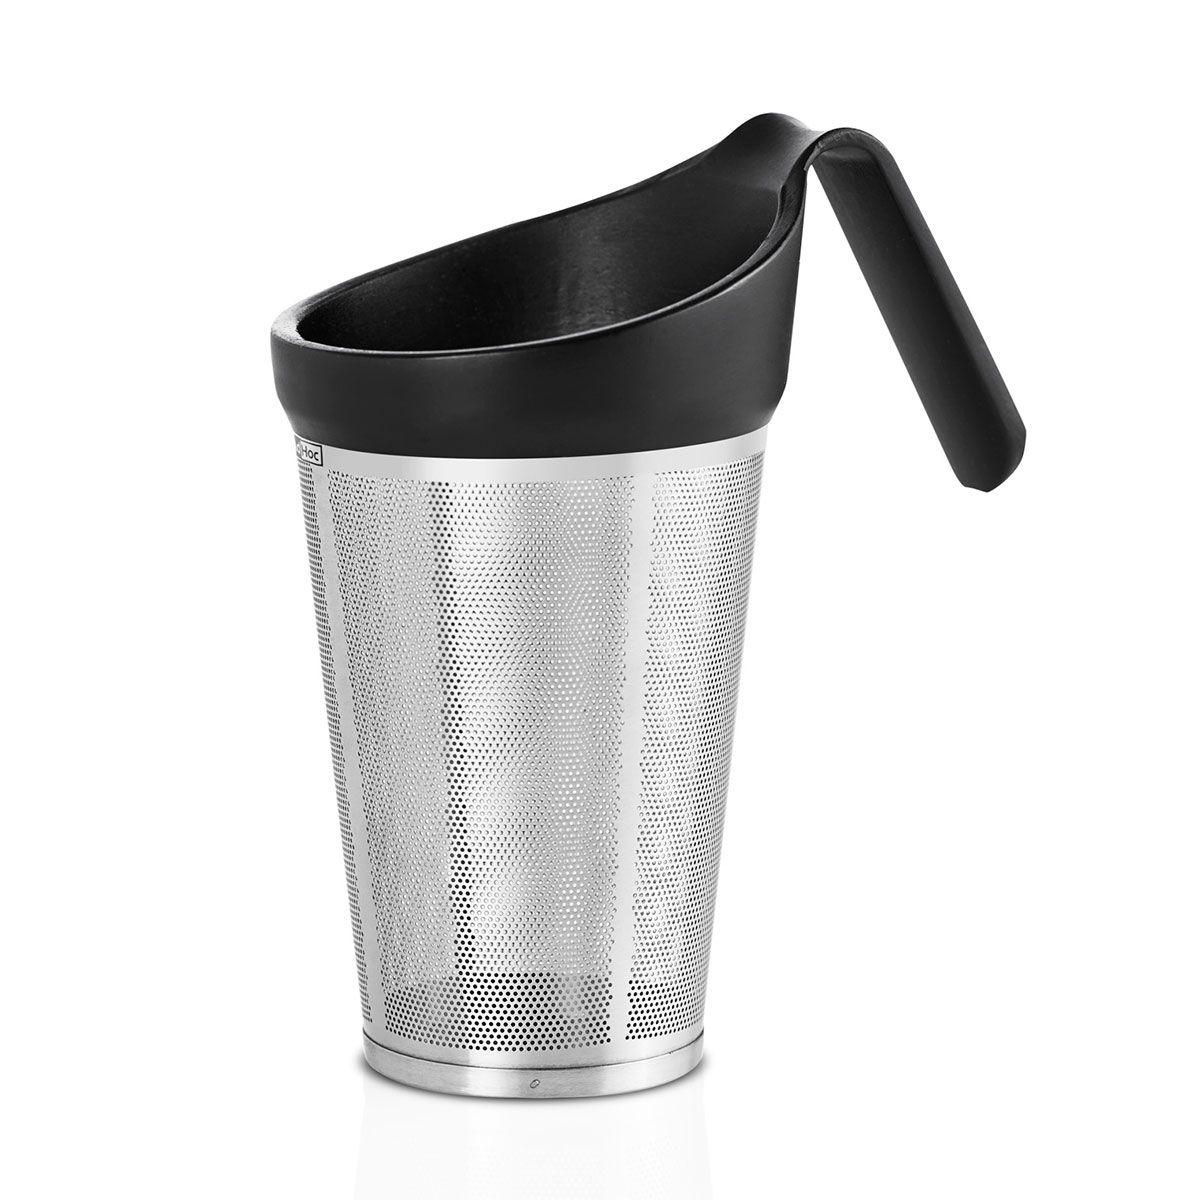 香料茶葉過濾器-main